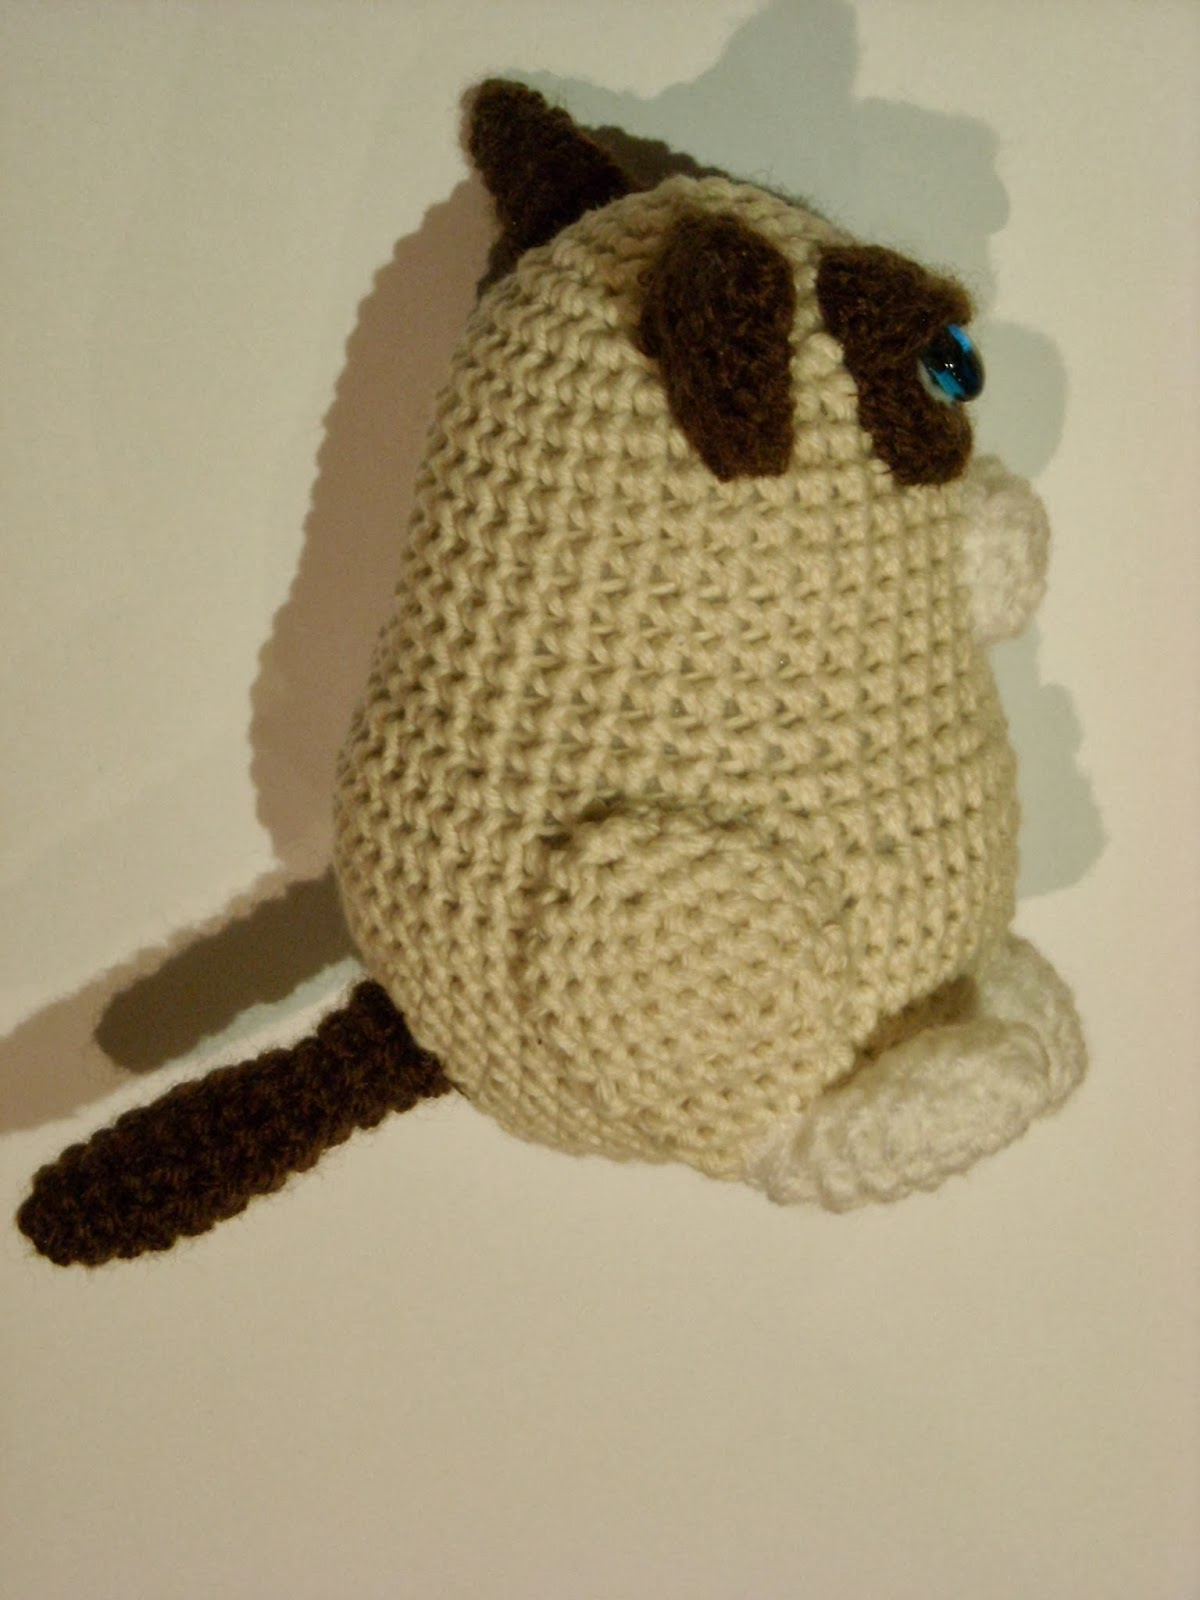 Pokey Kitty Cat Crochet Pattern: Grumpy Cat's Brother Pokey Cat ... | 1600x1200